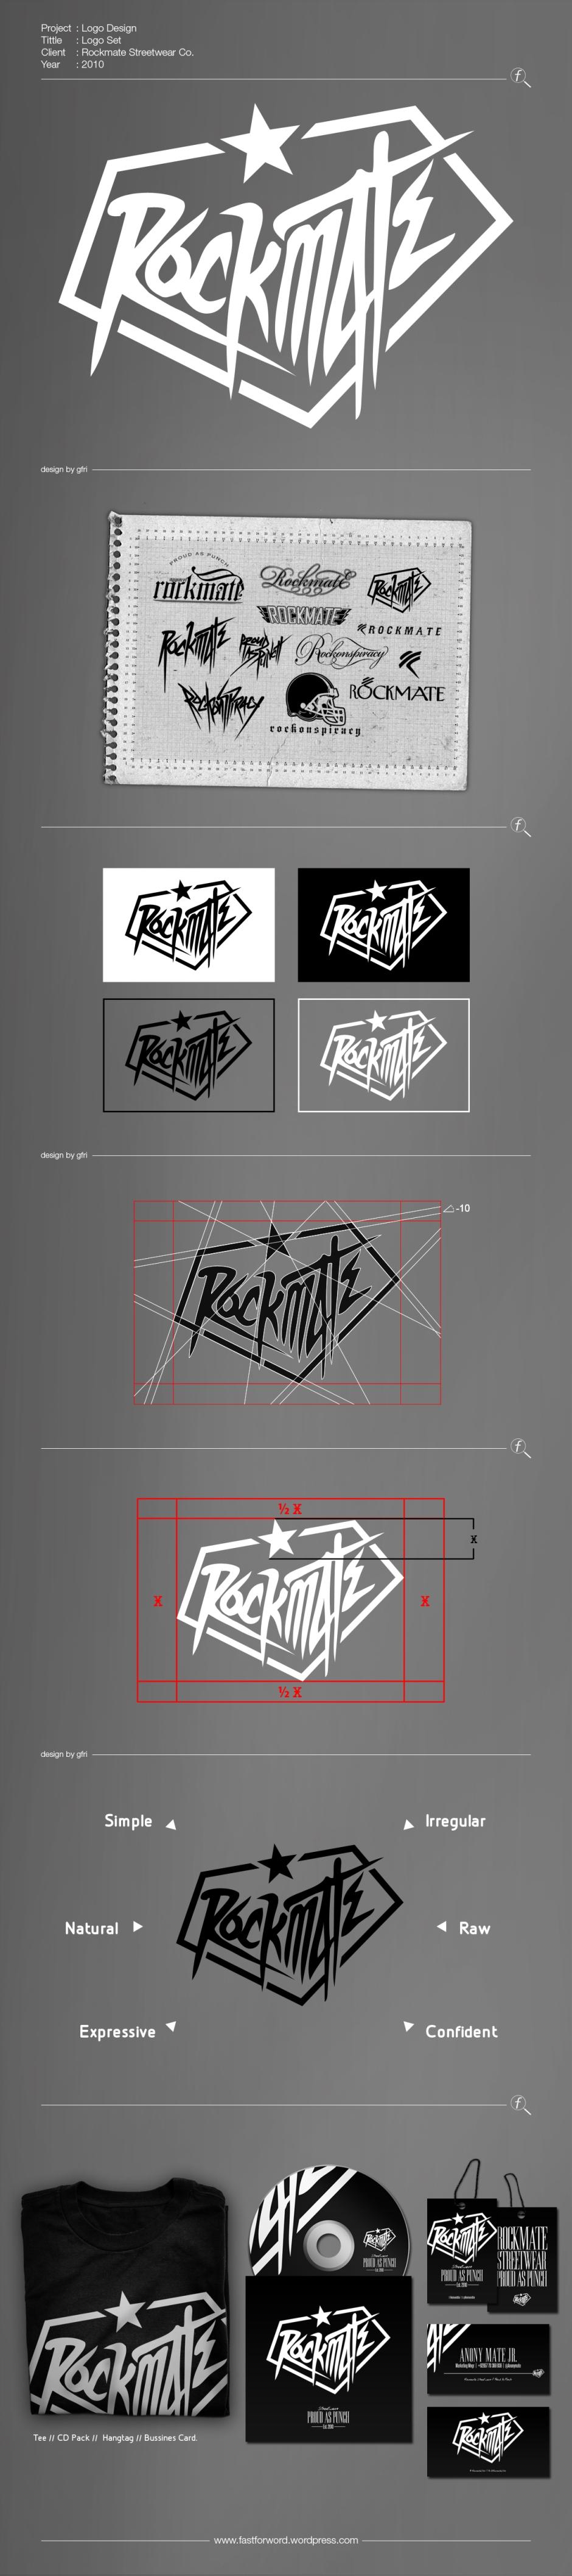 Preview-Rockmate-LogoSet